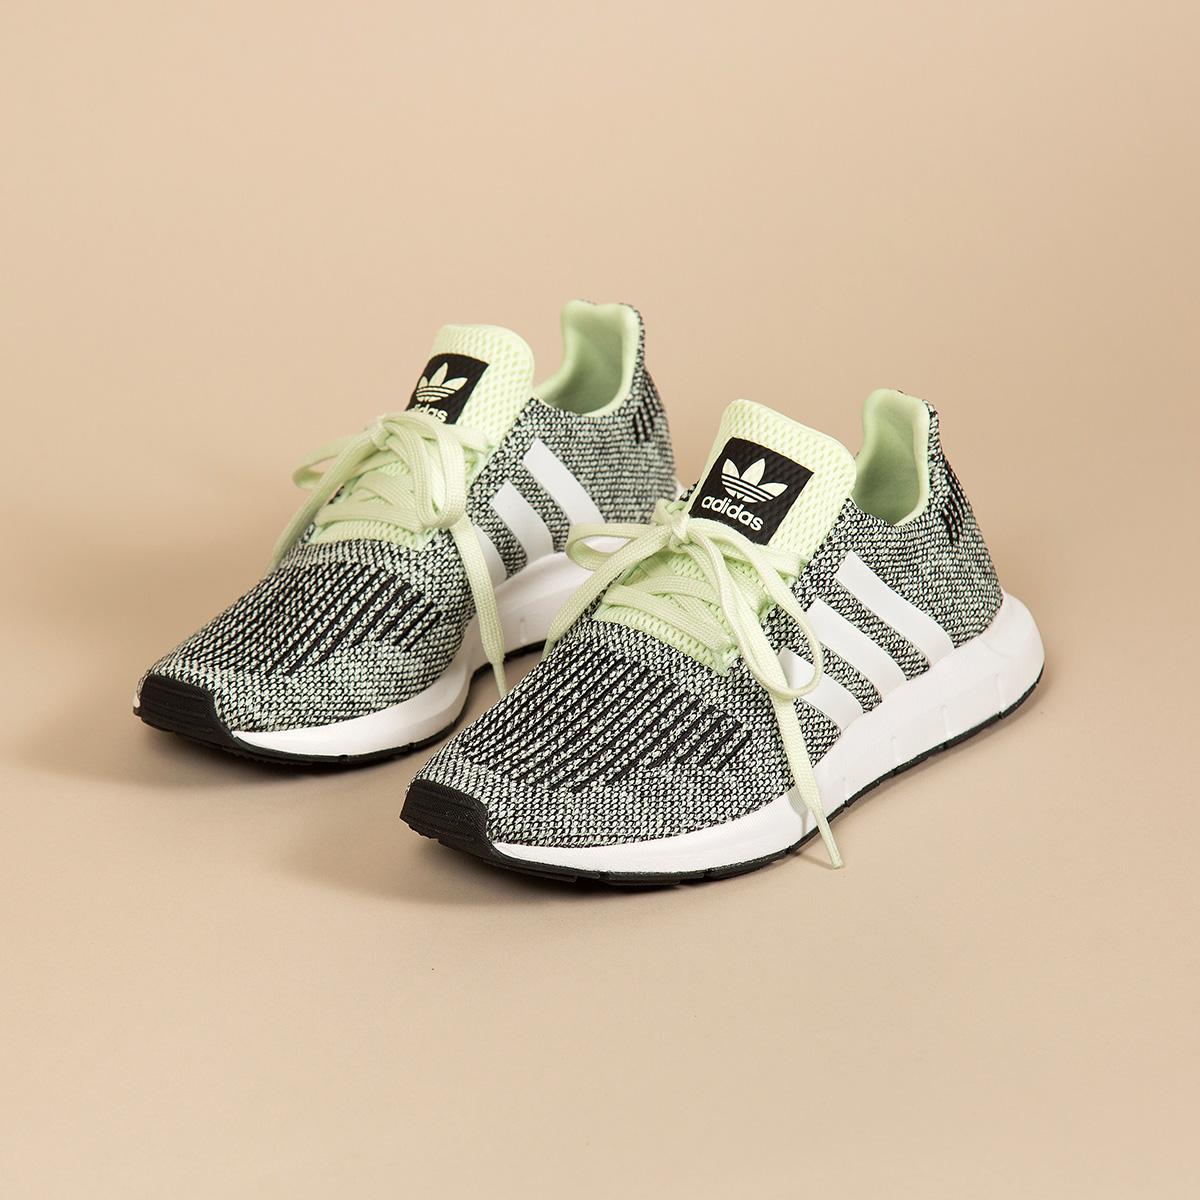 adidas Originals Swift Run in Aero Green